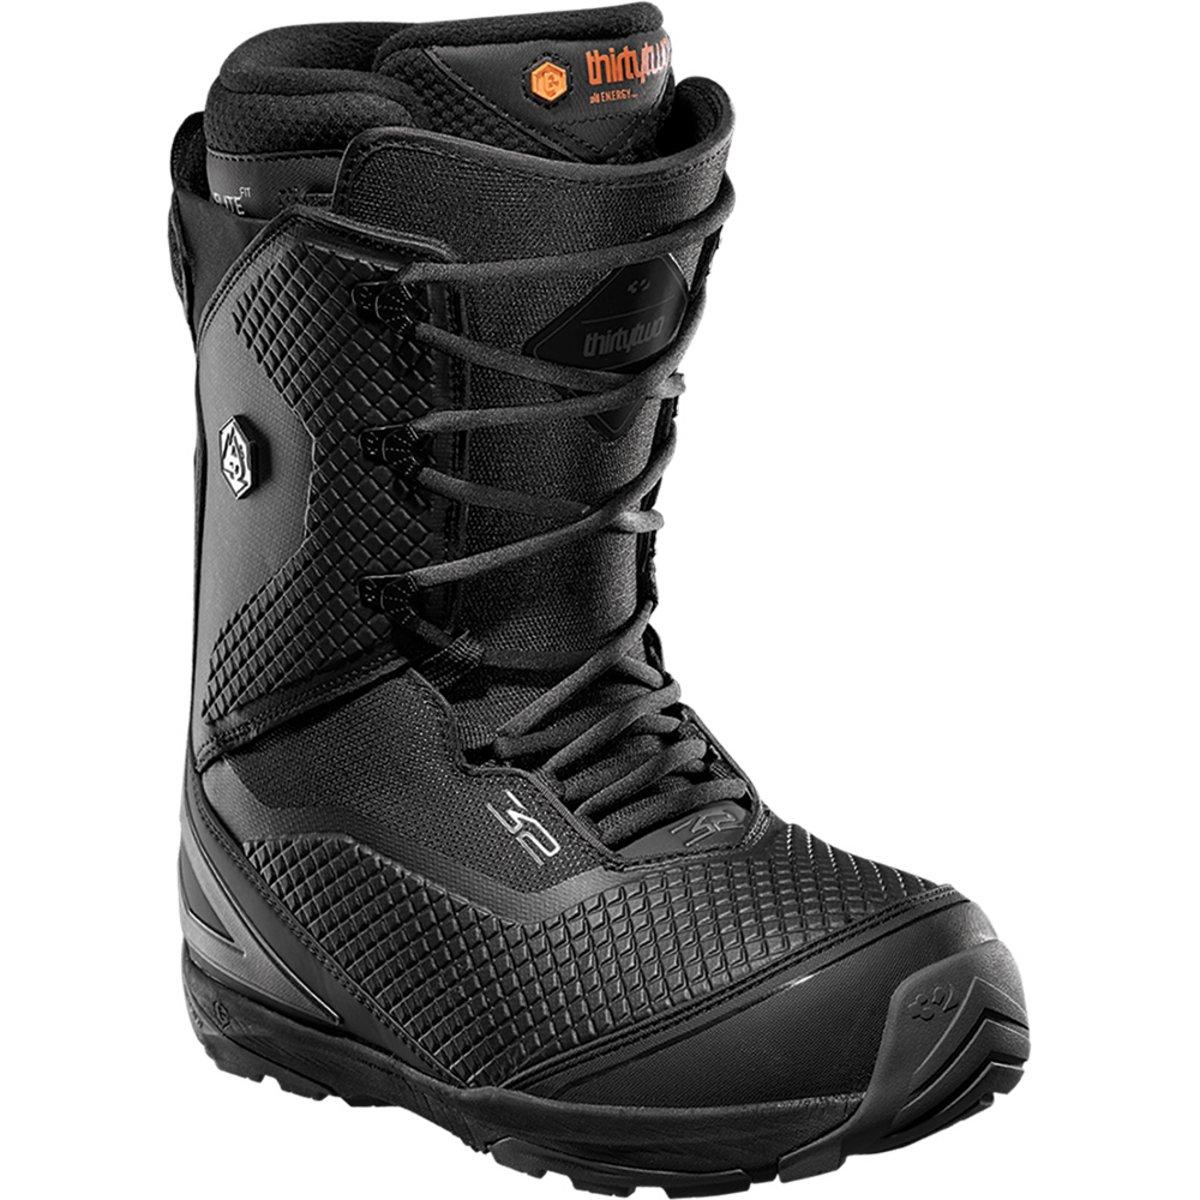 ThirtyTwo Men's TM3 Snowboard Boots 2019 / 2020 0